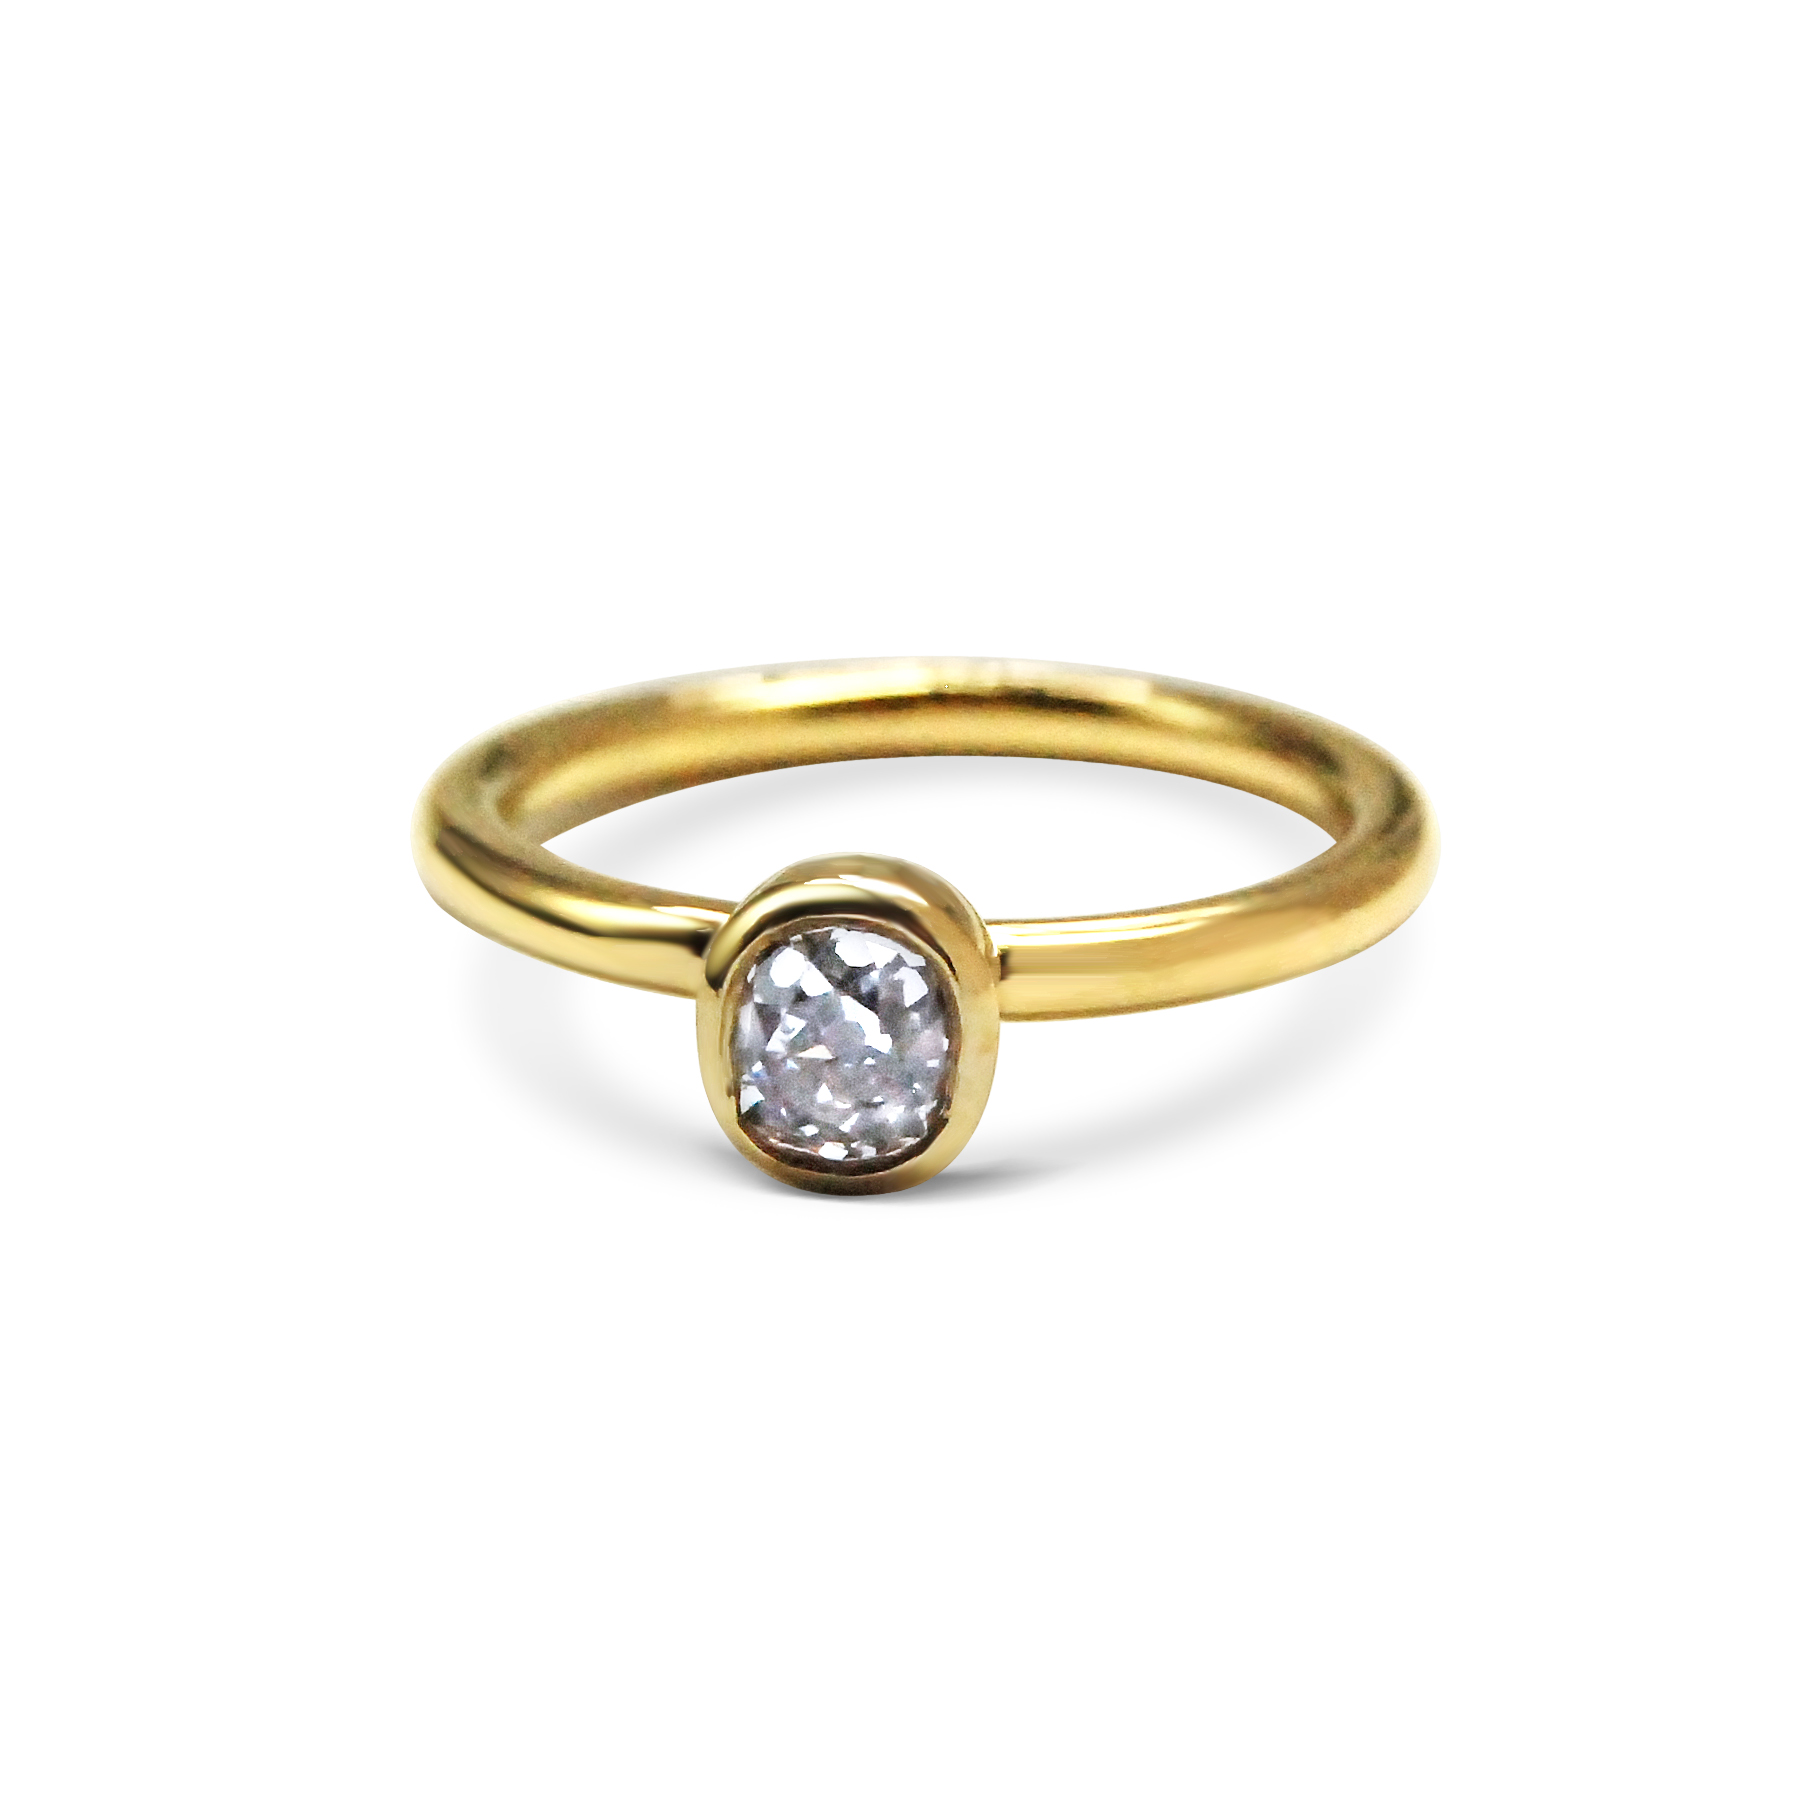 old-cut-diamond-18ct-yellow-gold-stacking-ring.jpg